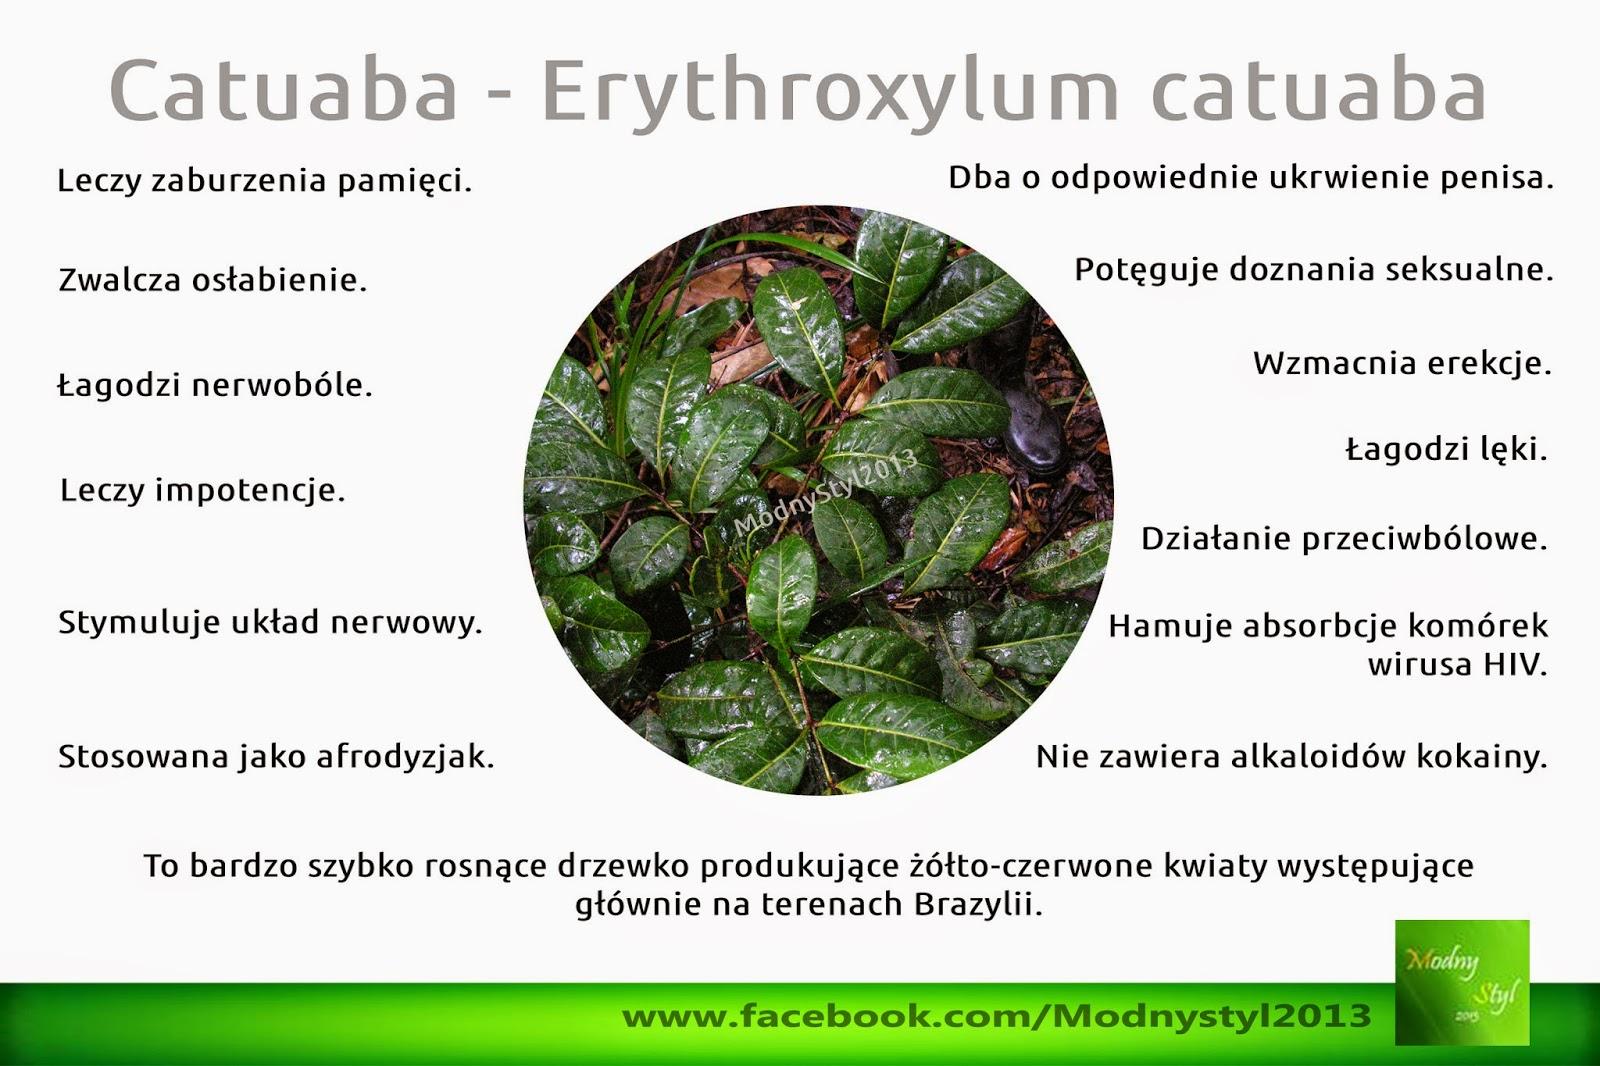 Catuaba - Erythroxylum catuaba